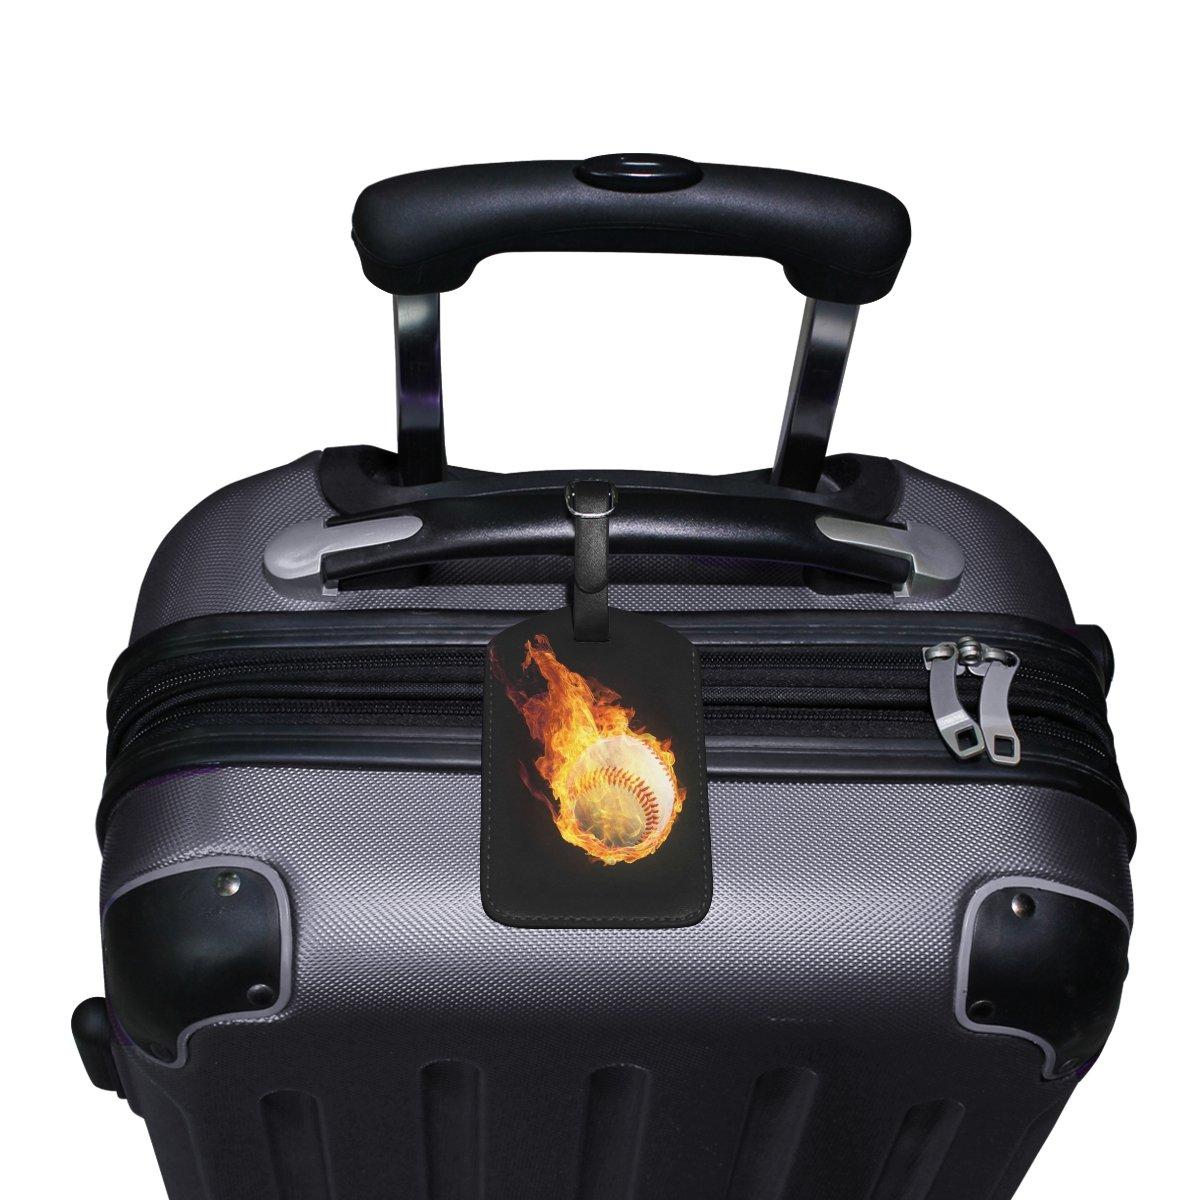 Saobao Travel Luggage Tag Baseball On Fire PU Leather Baggage Suitcase Travel ID Bag Tag 1Pcs